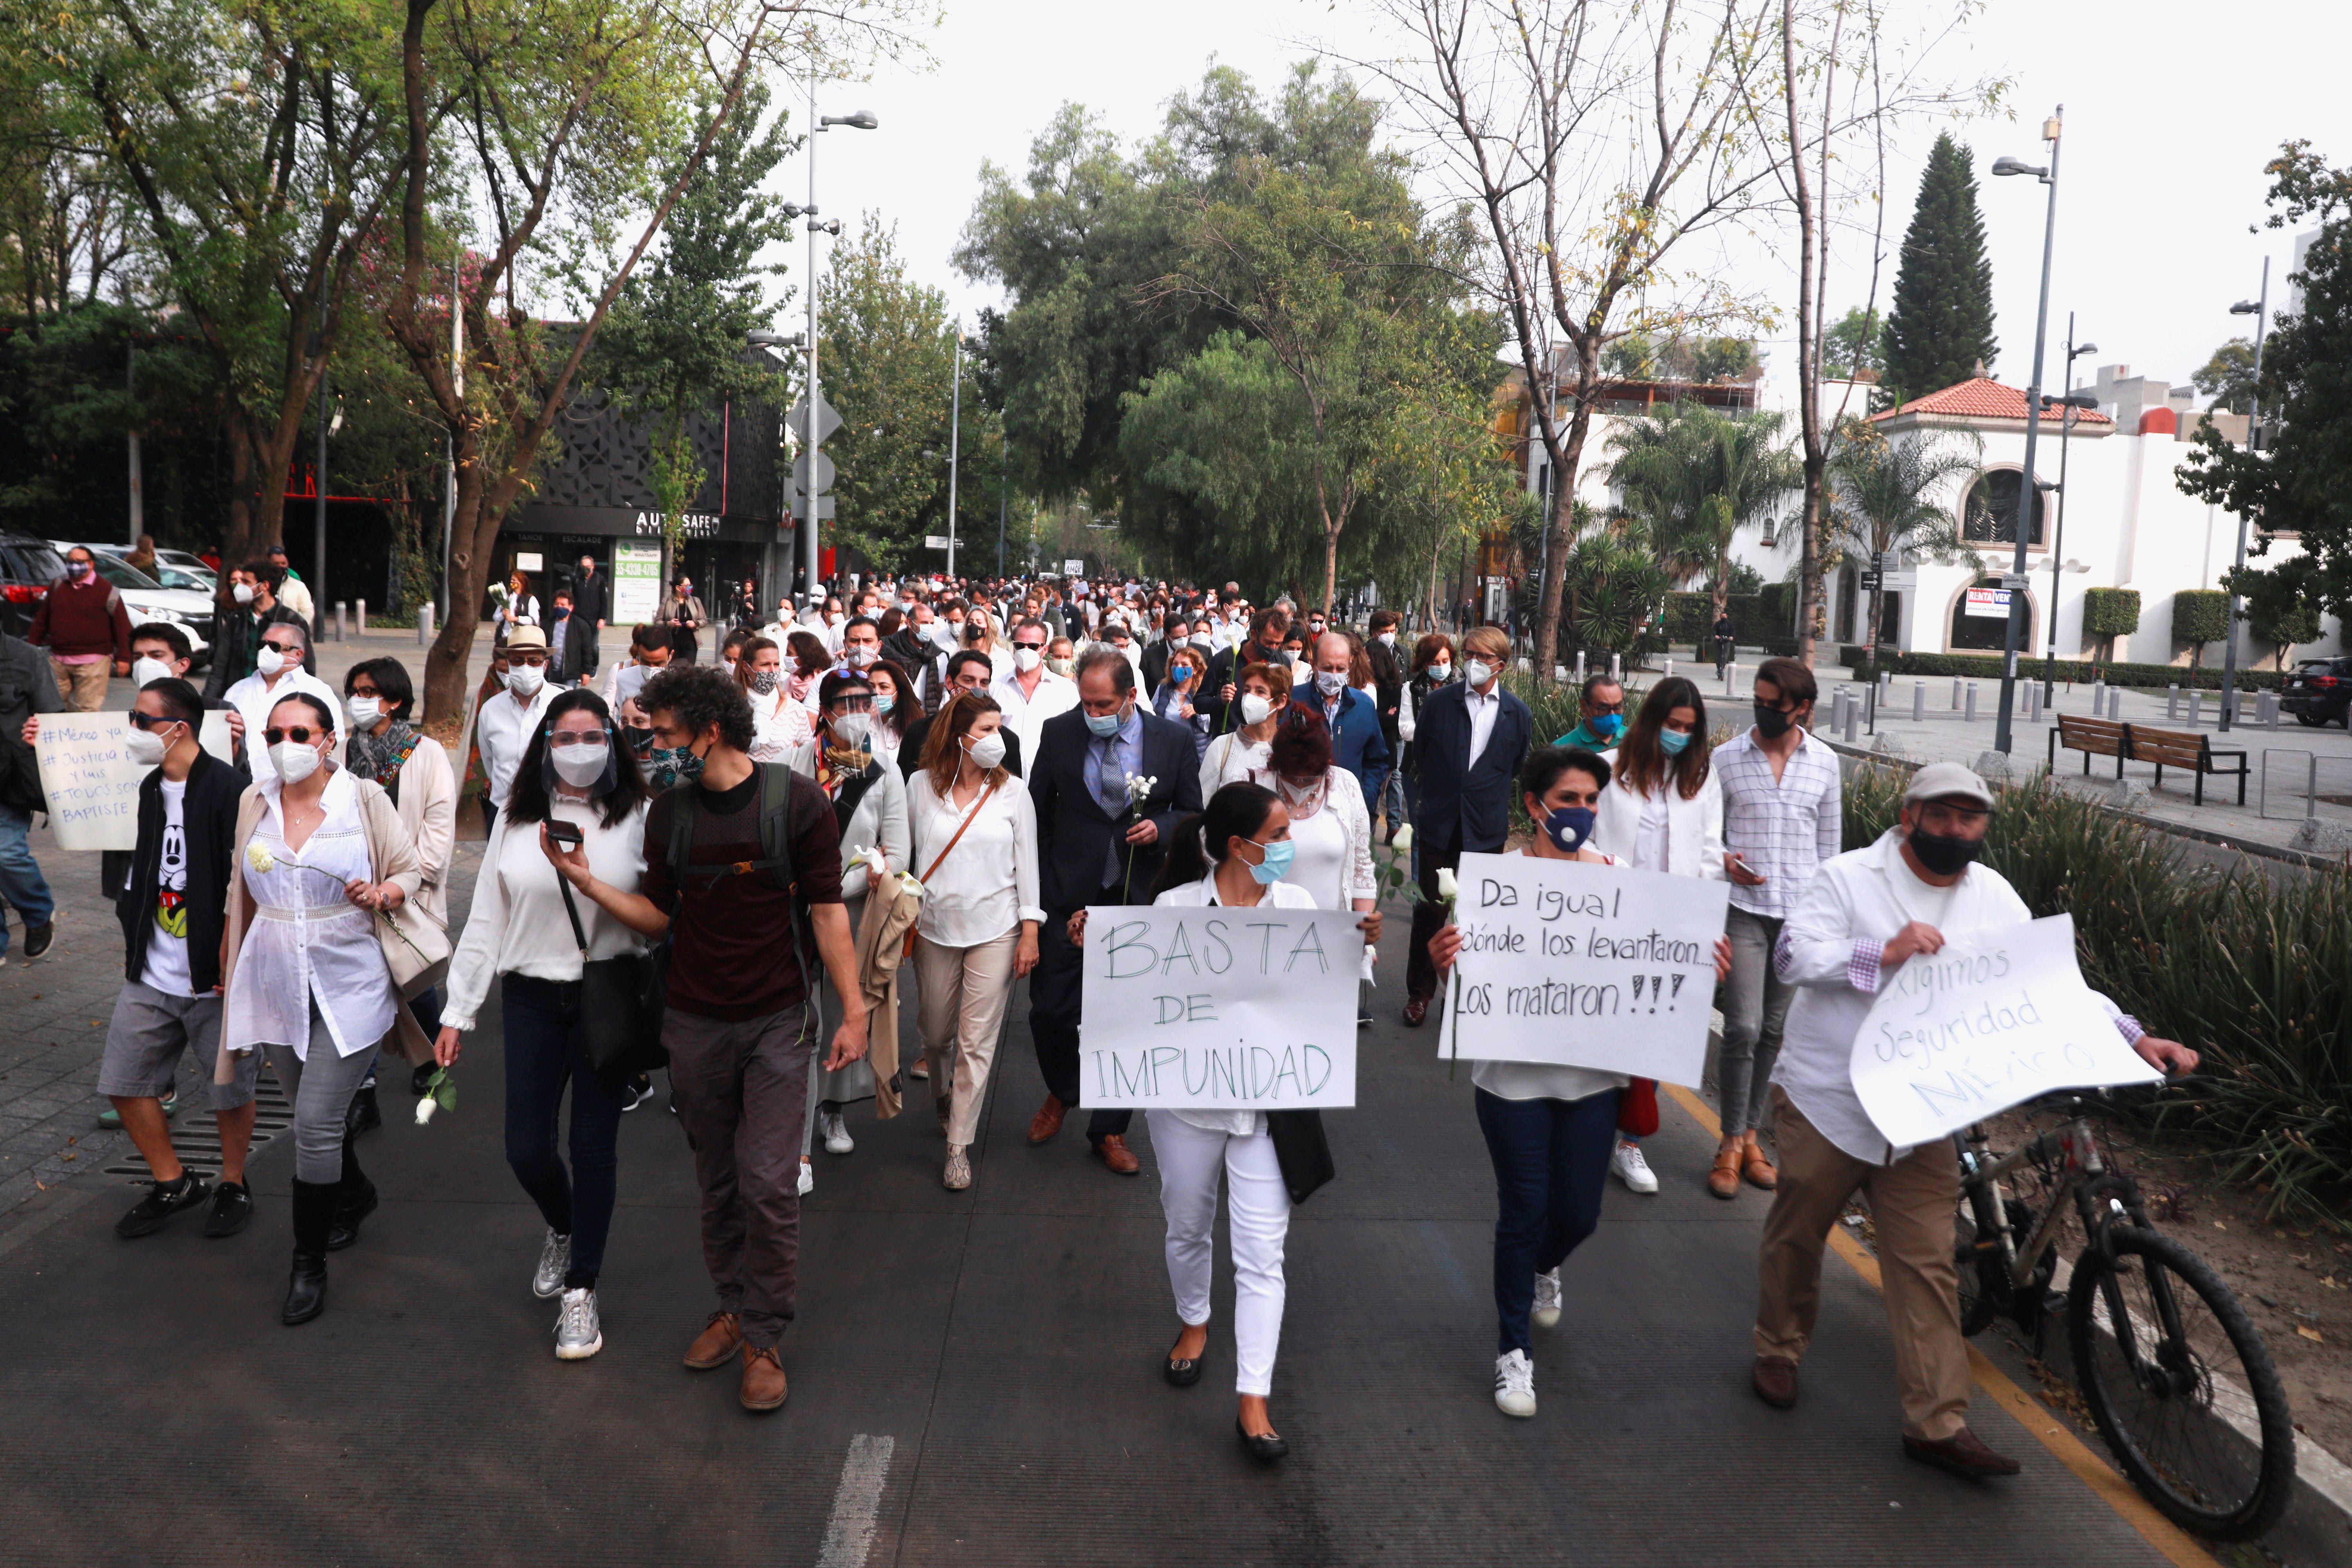 La comunidad francesa se movilizó en la capital para exigir justicia (Foto: REUTERS/Henry Romero)